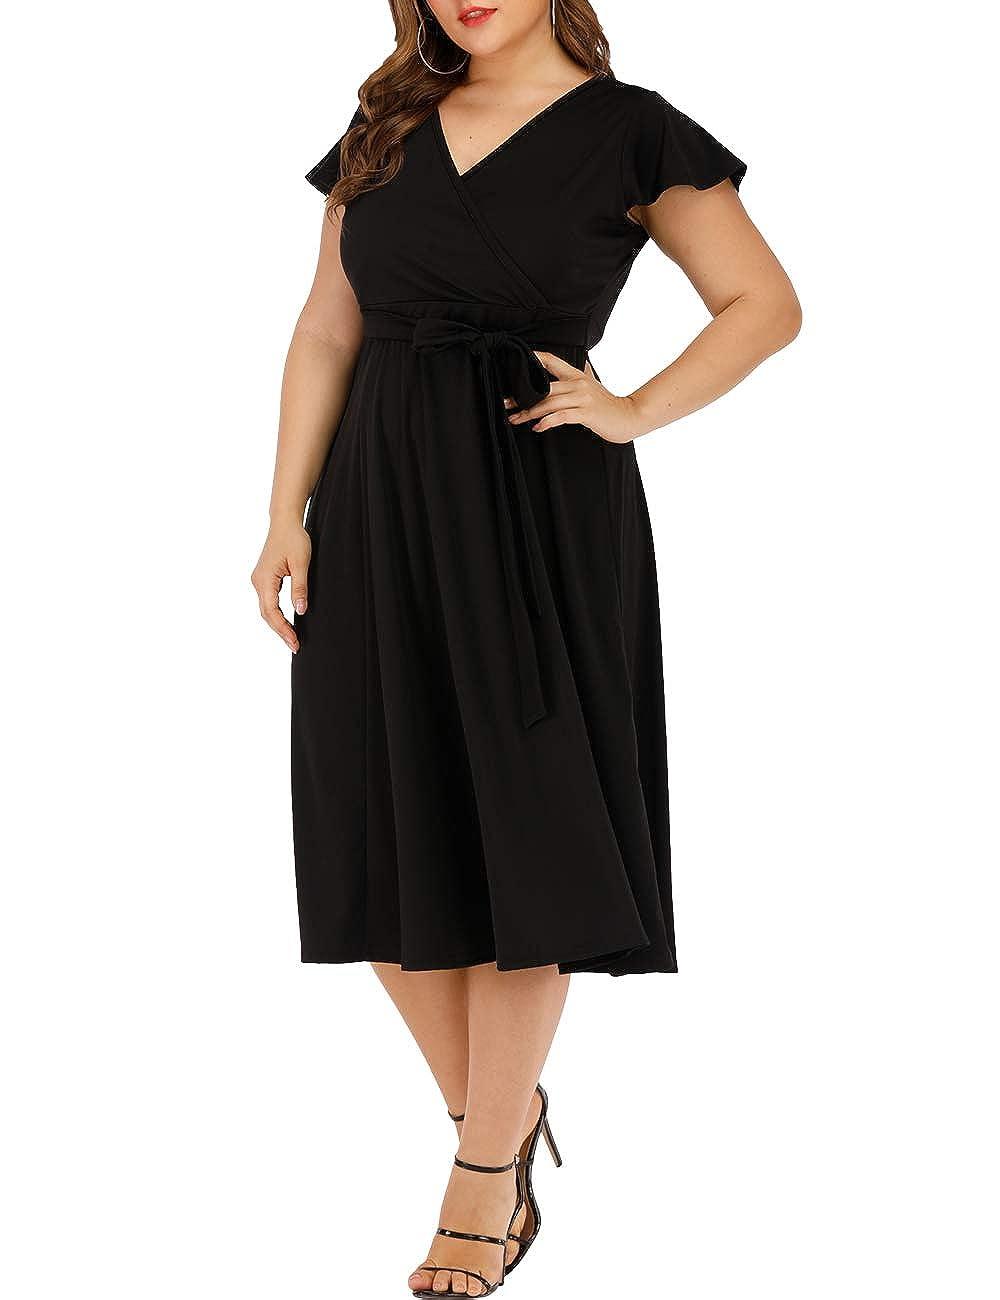 Agmibrelr Women\'s Short Sleeve Dress Deep V Neck A-Line Swing Plus Size  Midi Dresses